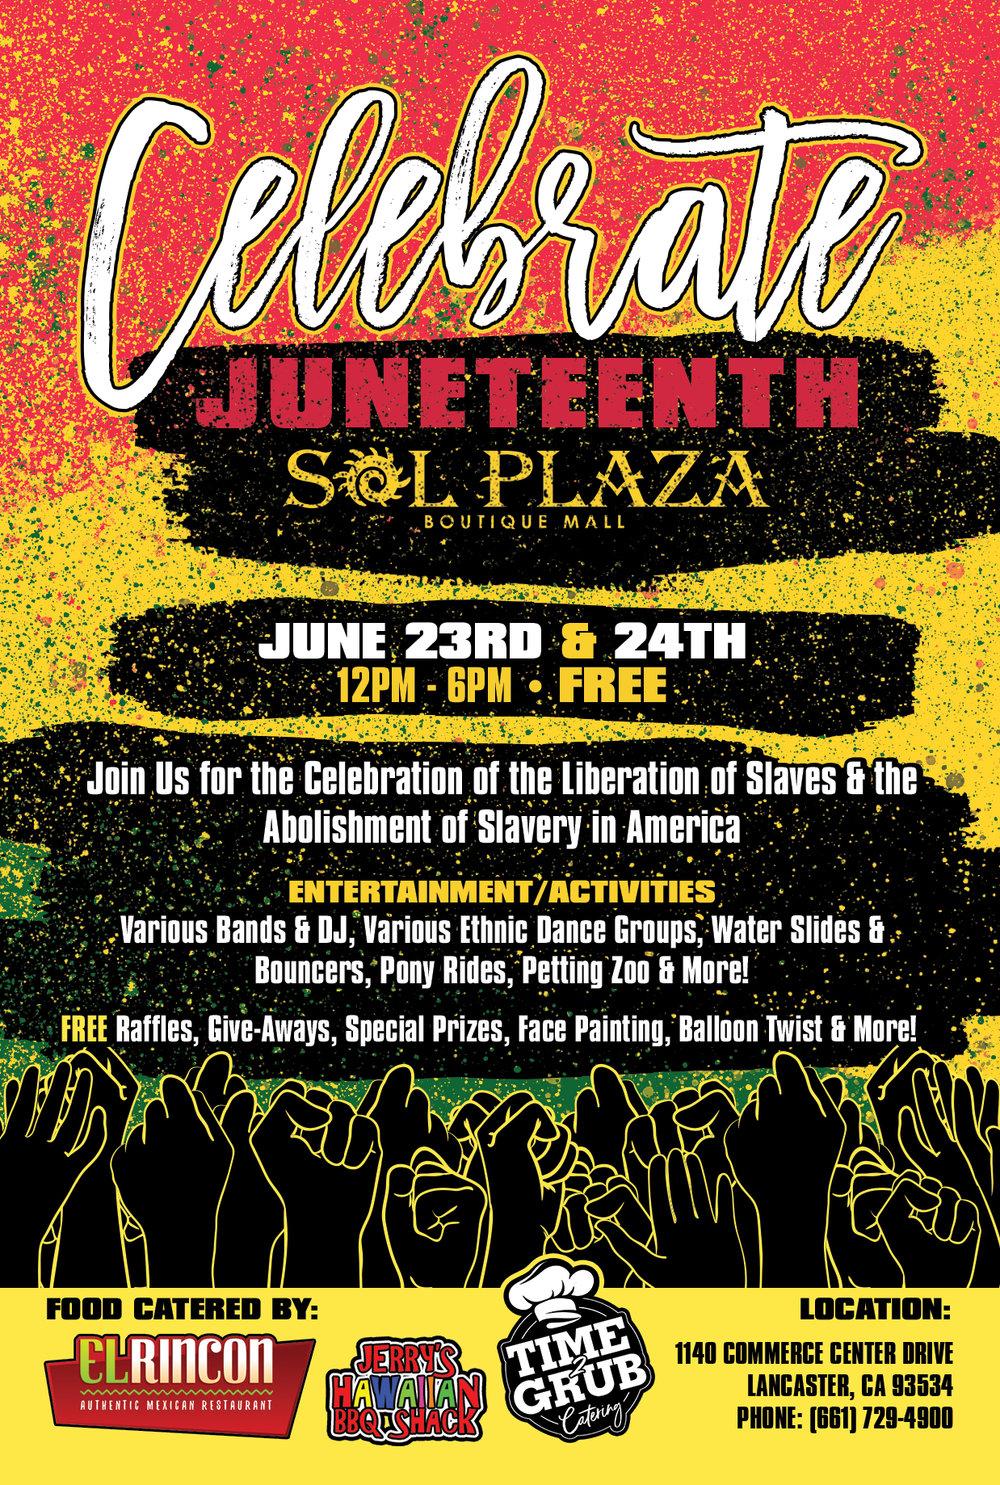 Sol-Plaza-Juneteenth-Flyer-Updated.jpg